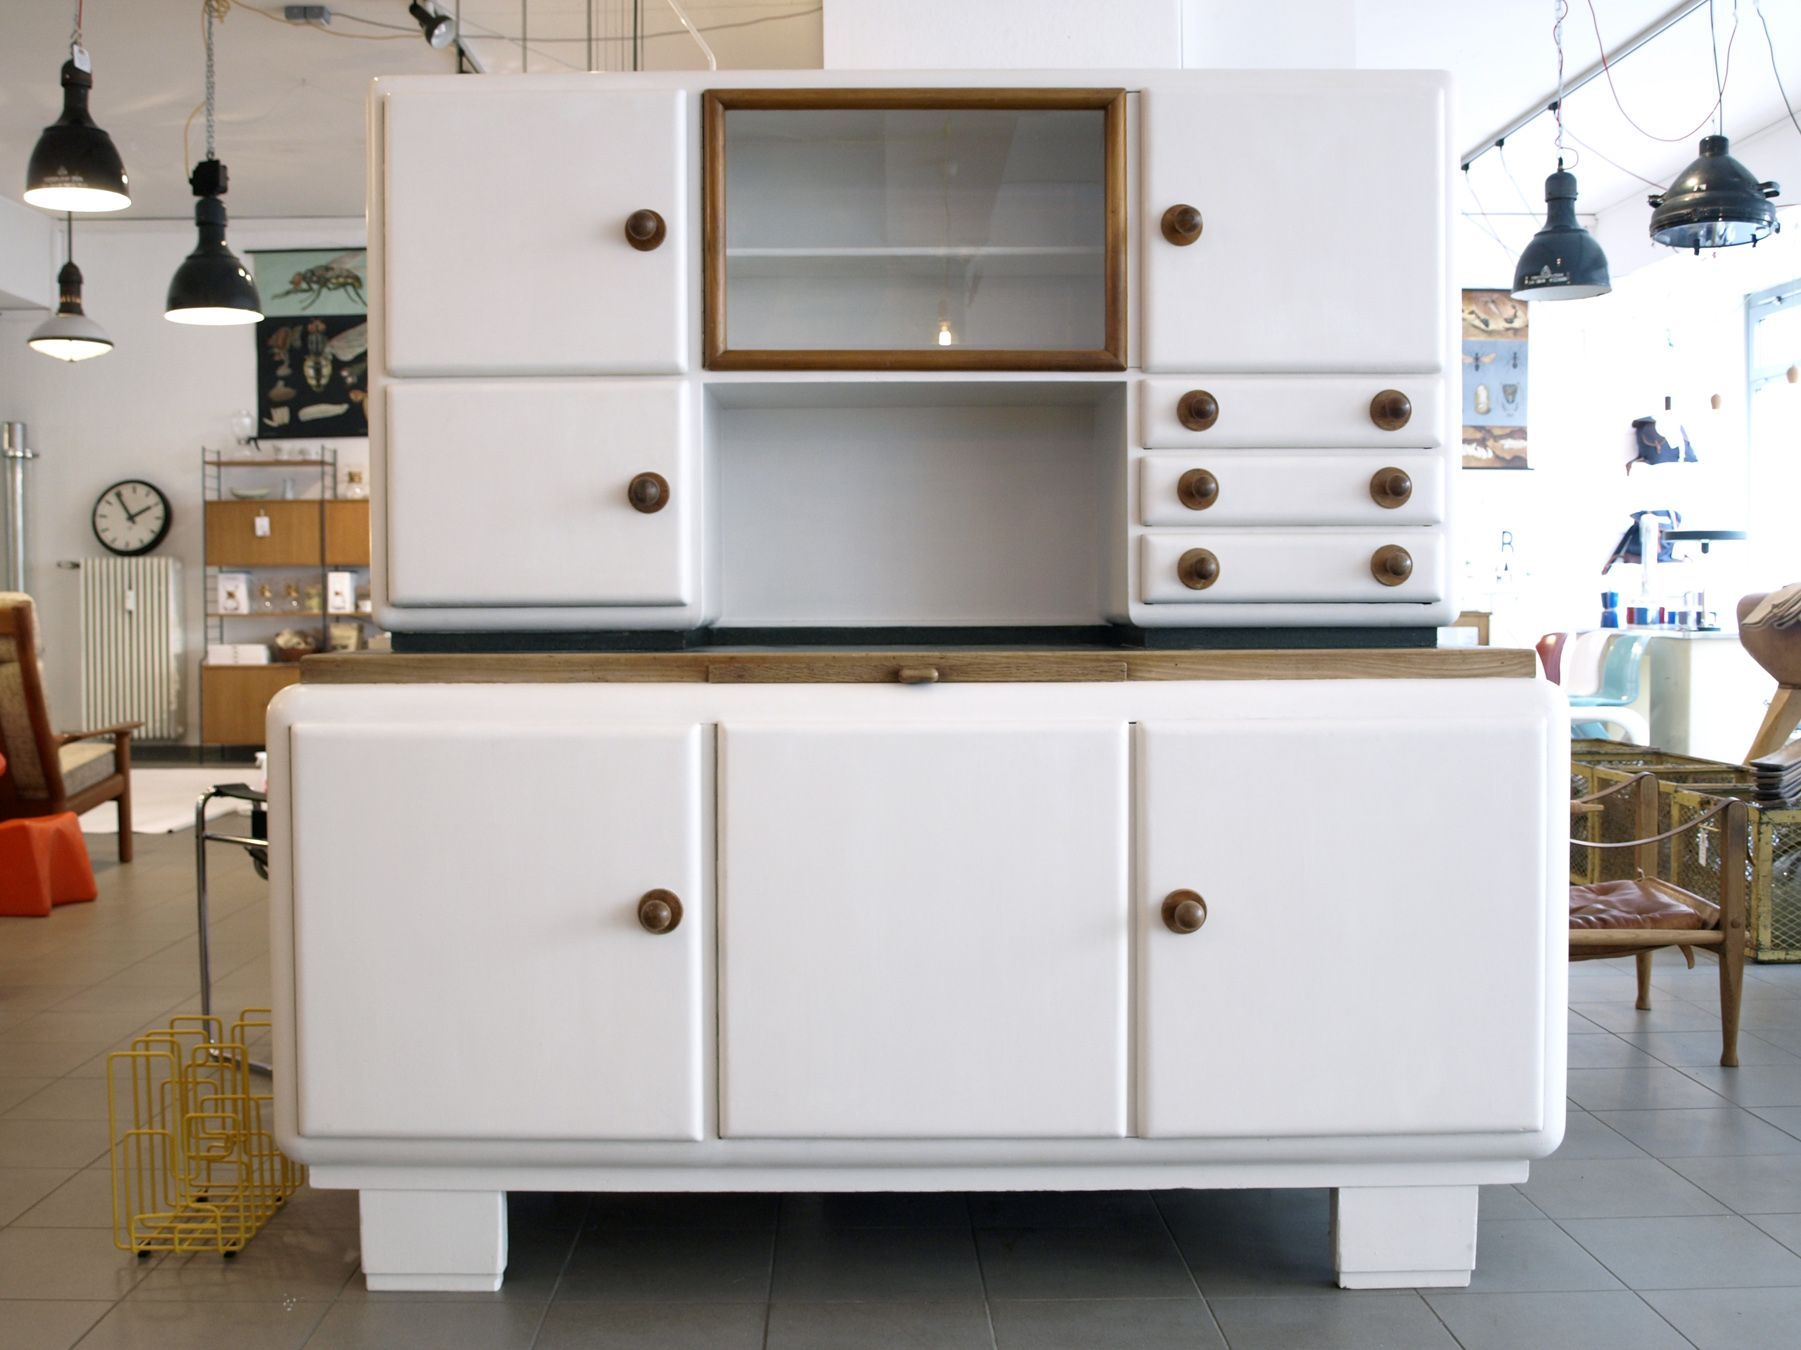 k chenbuffet 20er k chenbuffets pinterest. Black Bedroom Furniture Sets. Home Design Ideas